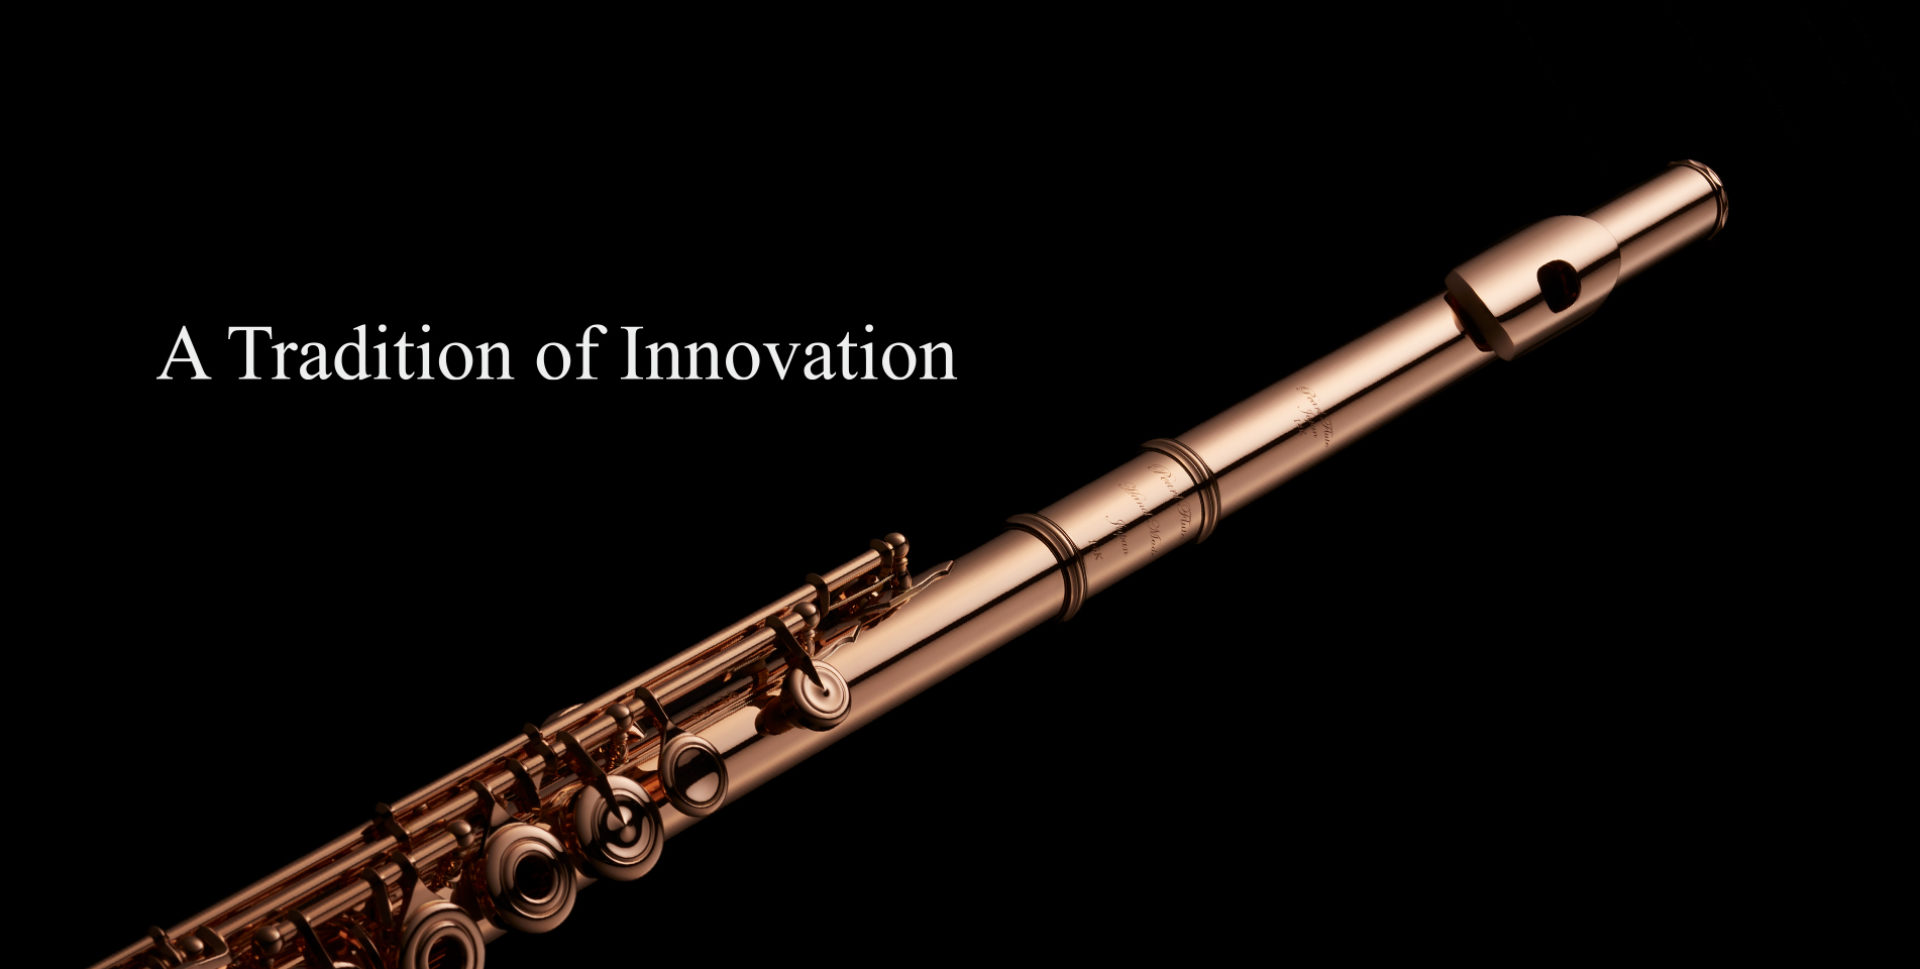 パール楽器製造株式会社|Pearl Flute